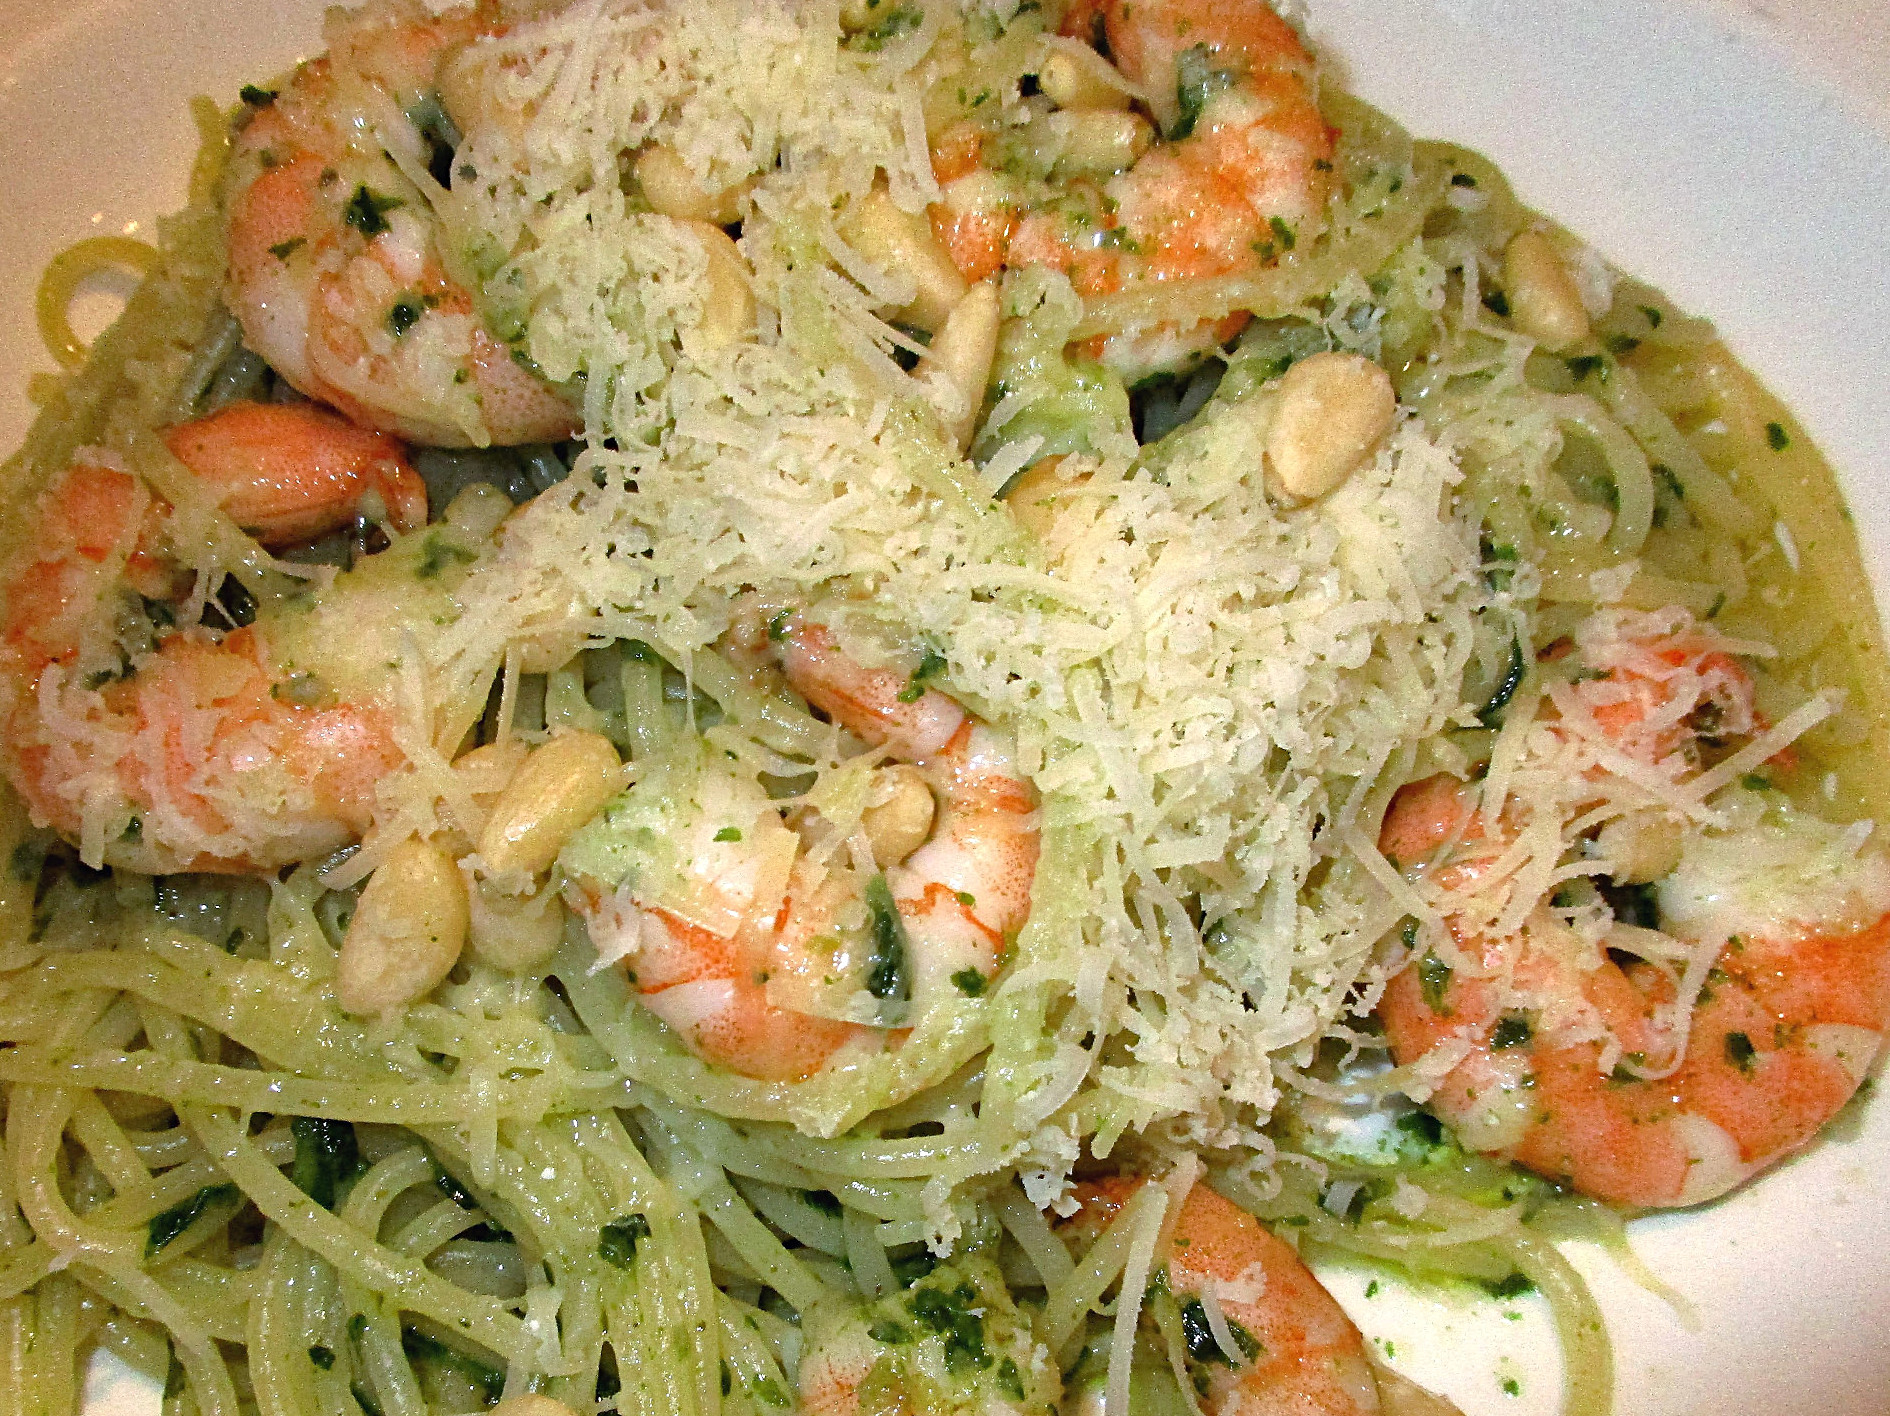 recette spaghetti aux crevettes roses et pesto